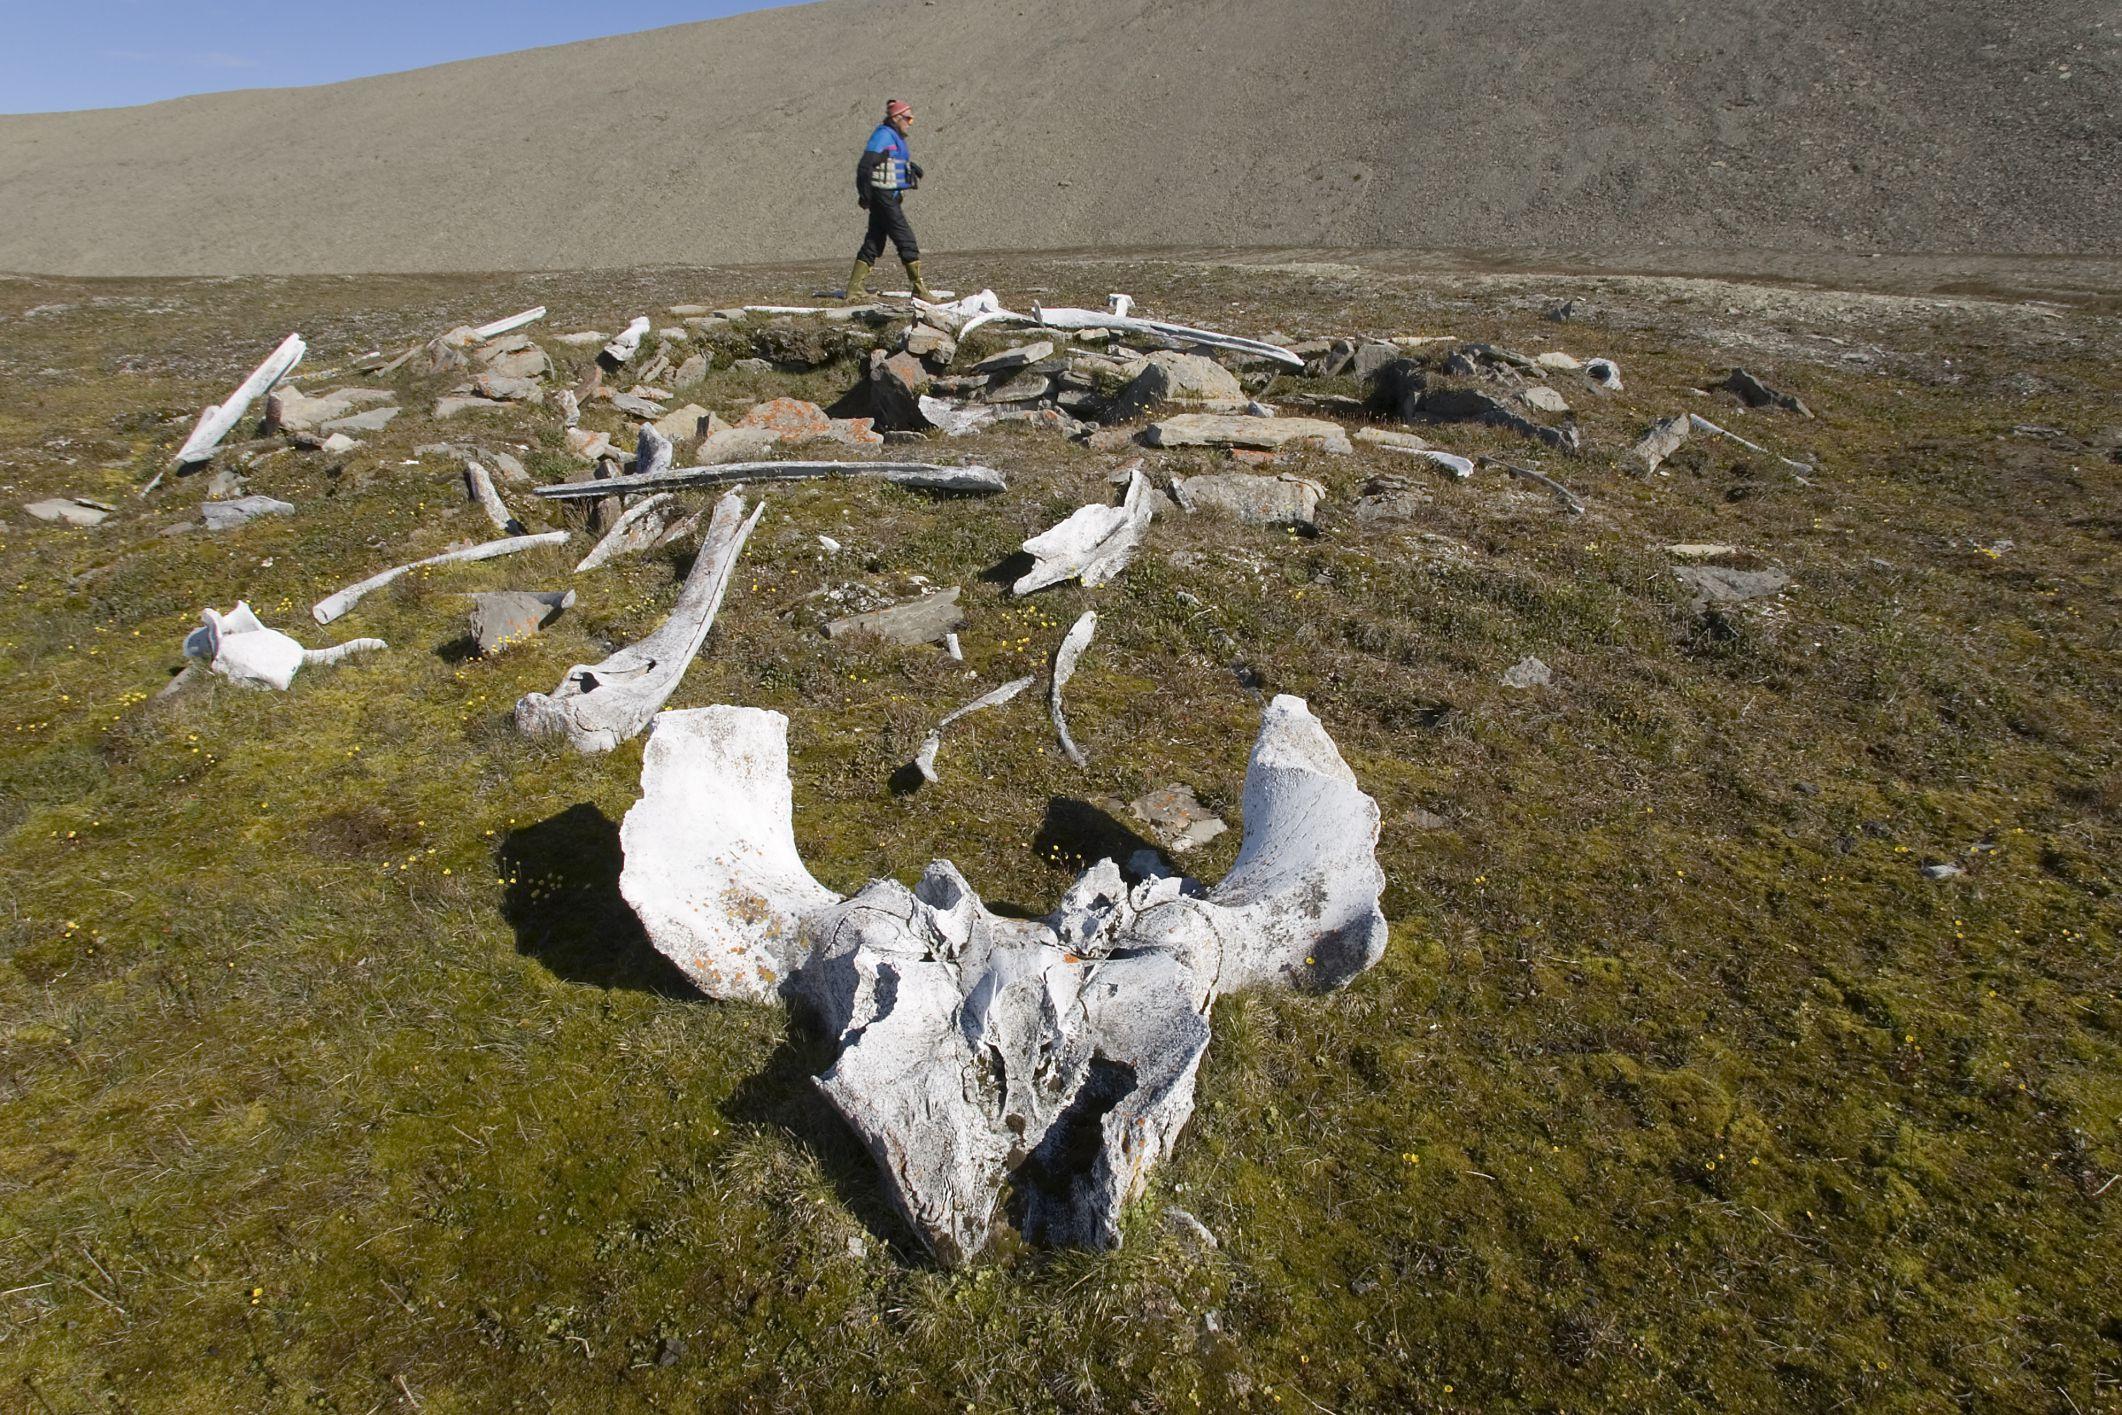 Inuit Semi-Υπόγειο Κατοικία με Bowhead Whale Bone στο Radstock Bay, Nunavut, Καναδάς